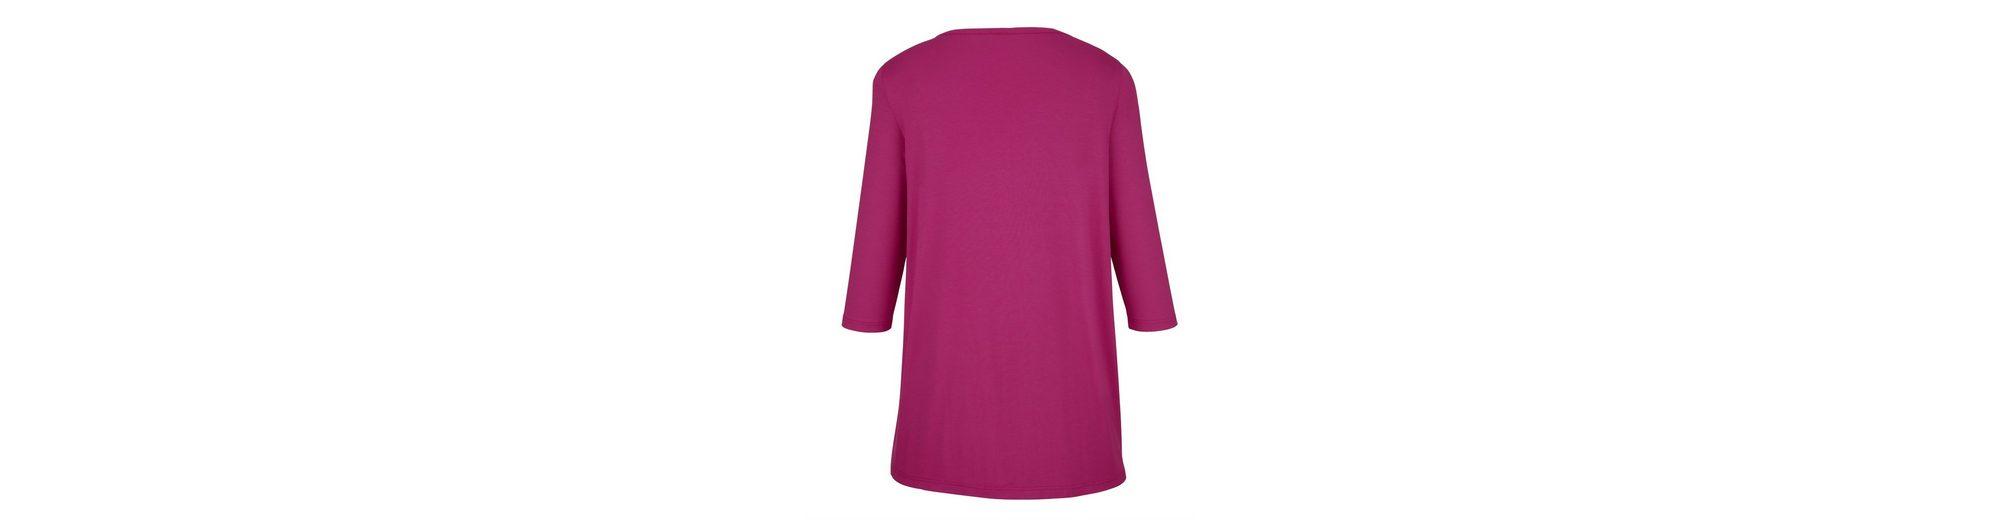 MIAMODA Longshirt aus Viskose-Stretch Material Günstig Online 6iZd3NH8jY